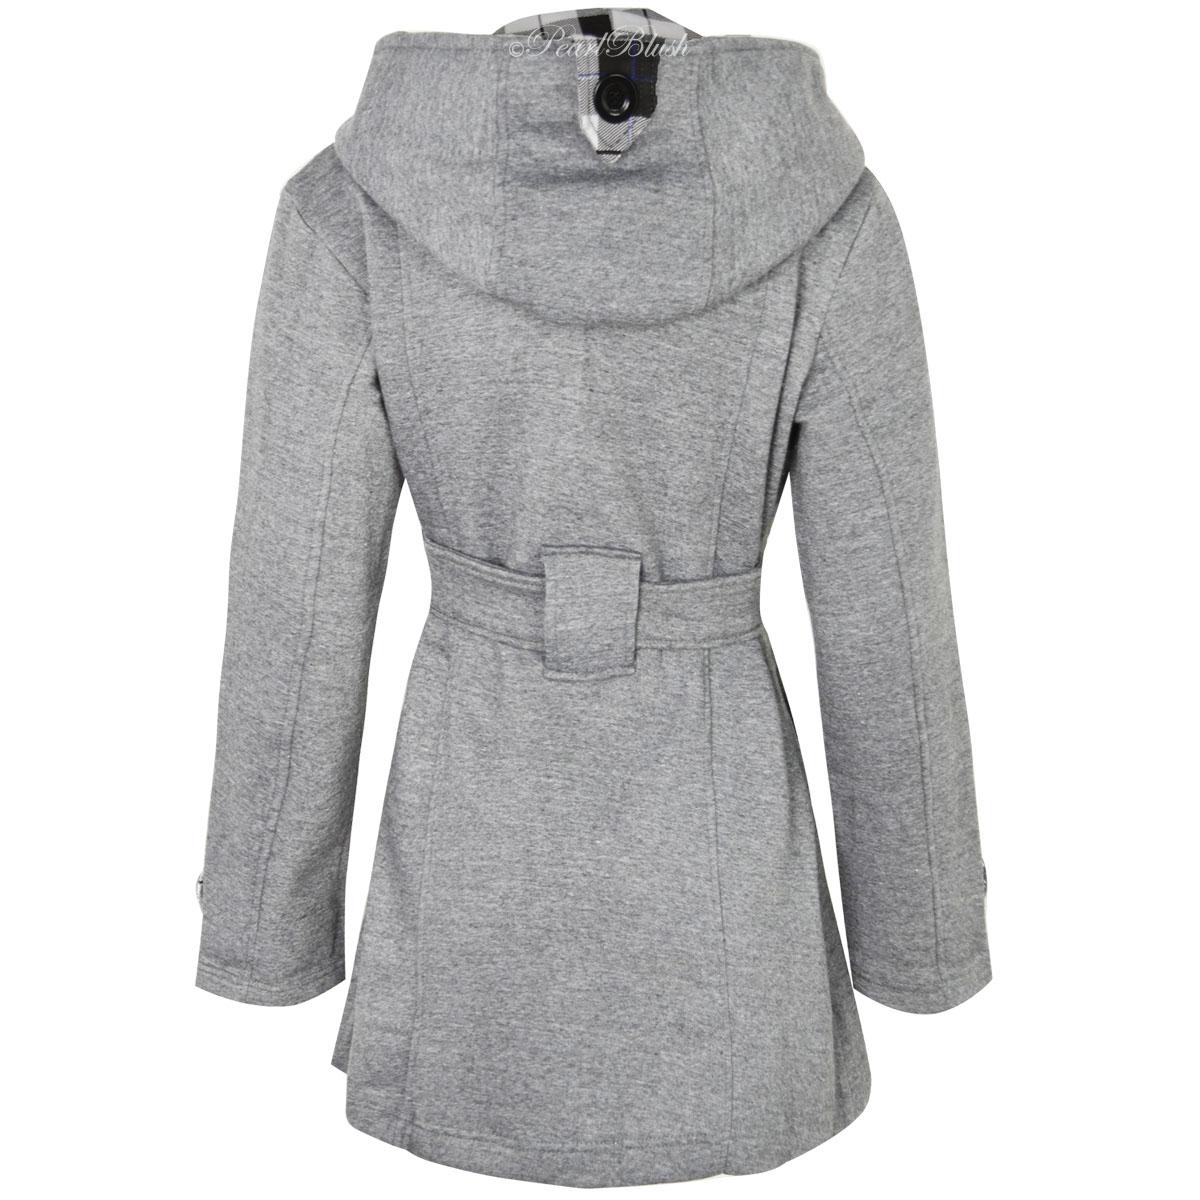 Mac coats women